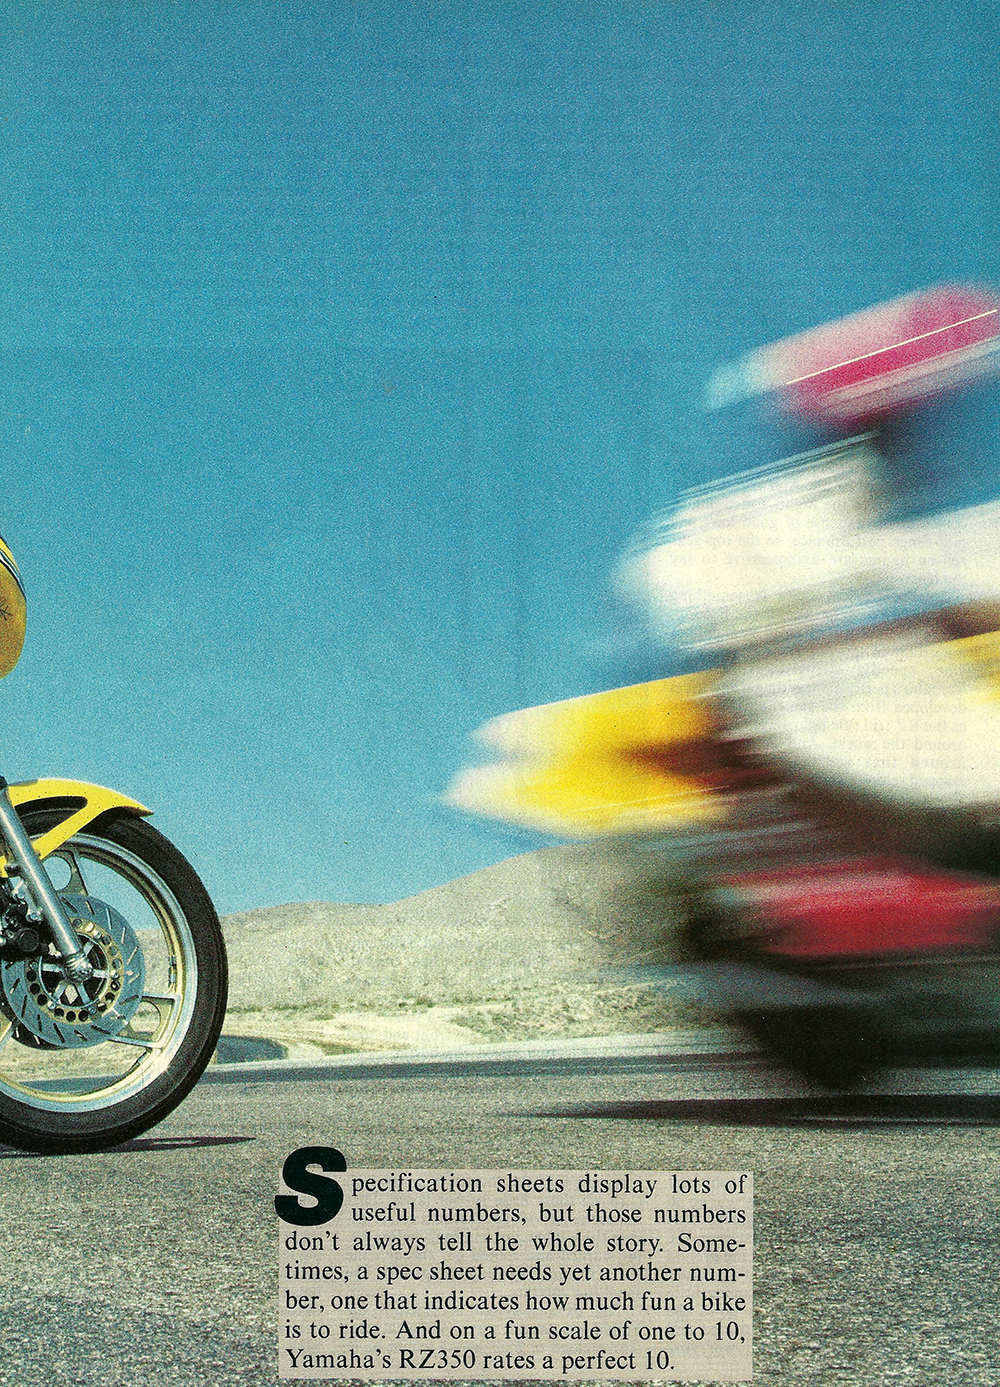 1984 Yamaha RZ350 road test 02.jpg